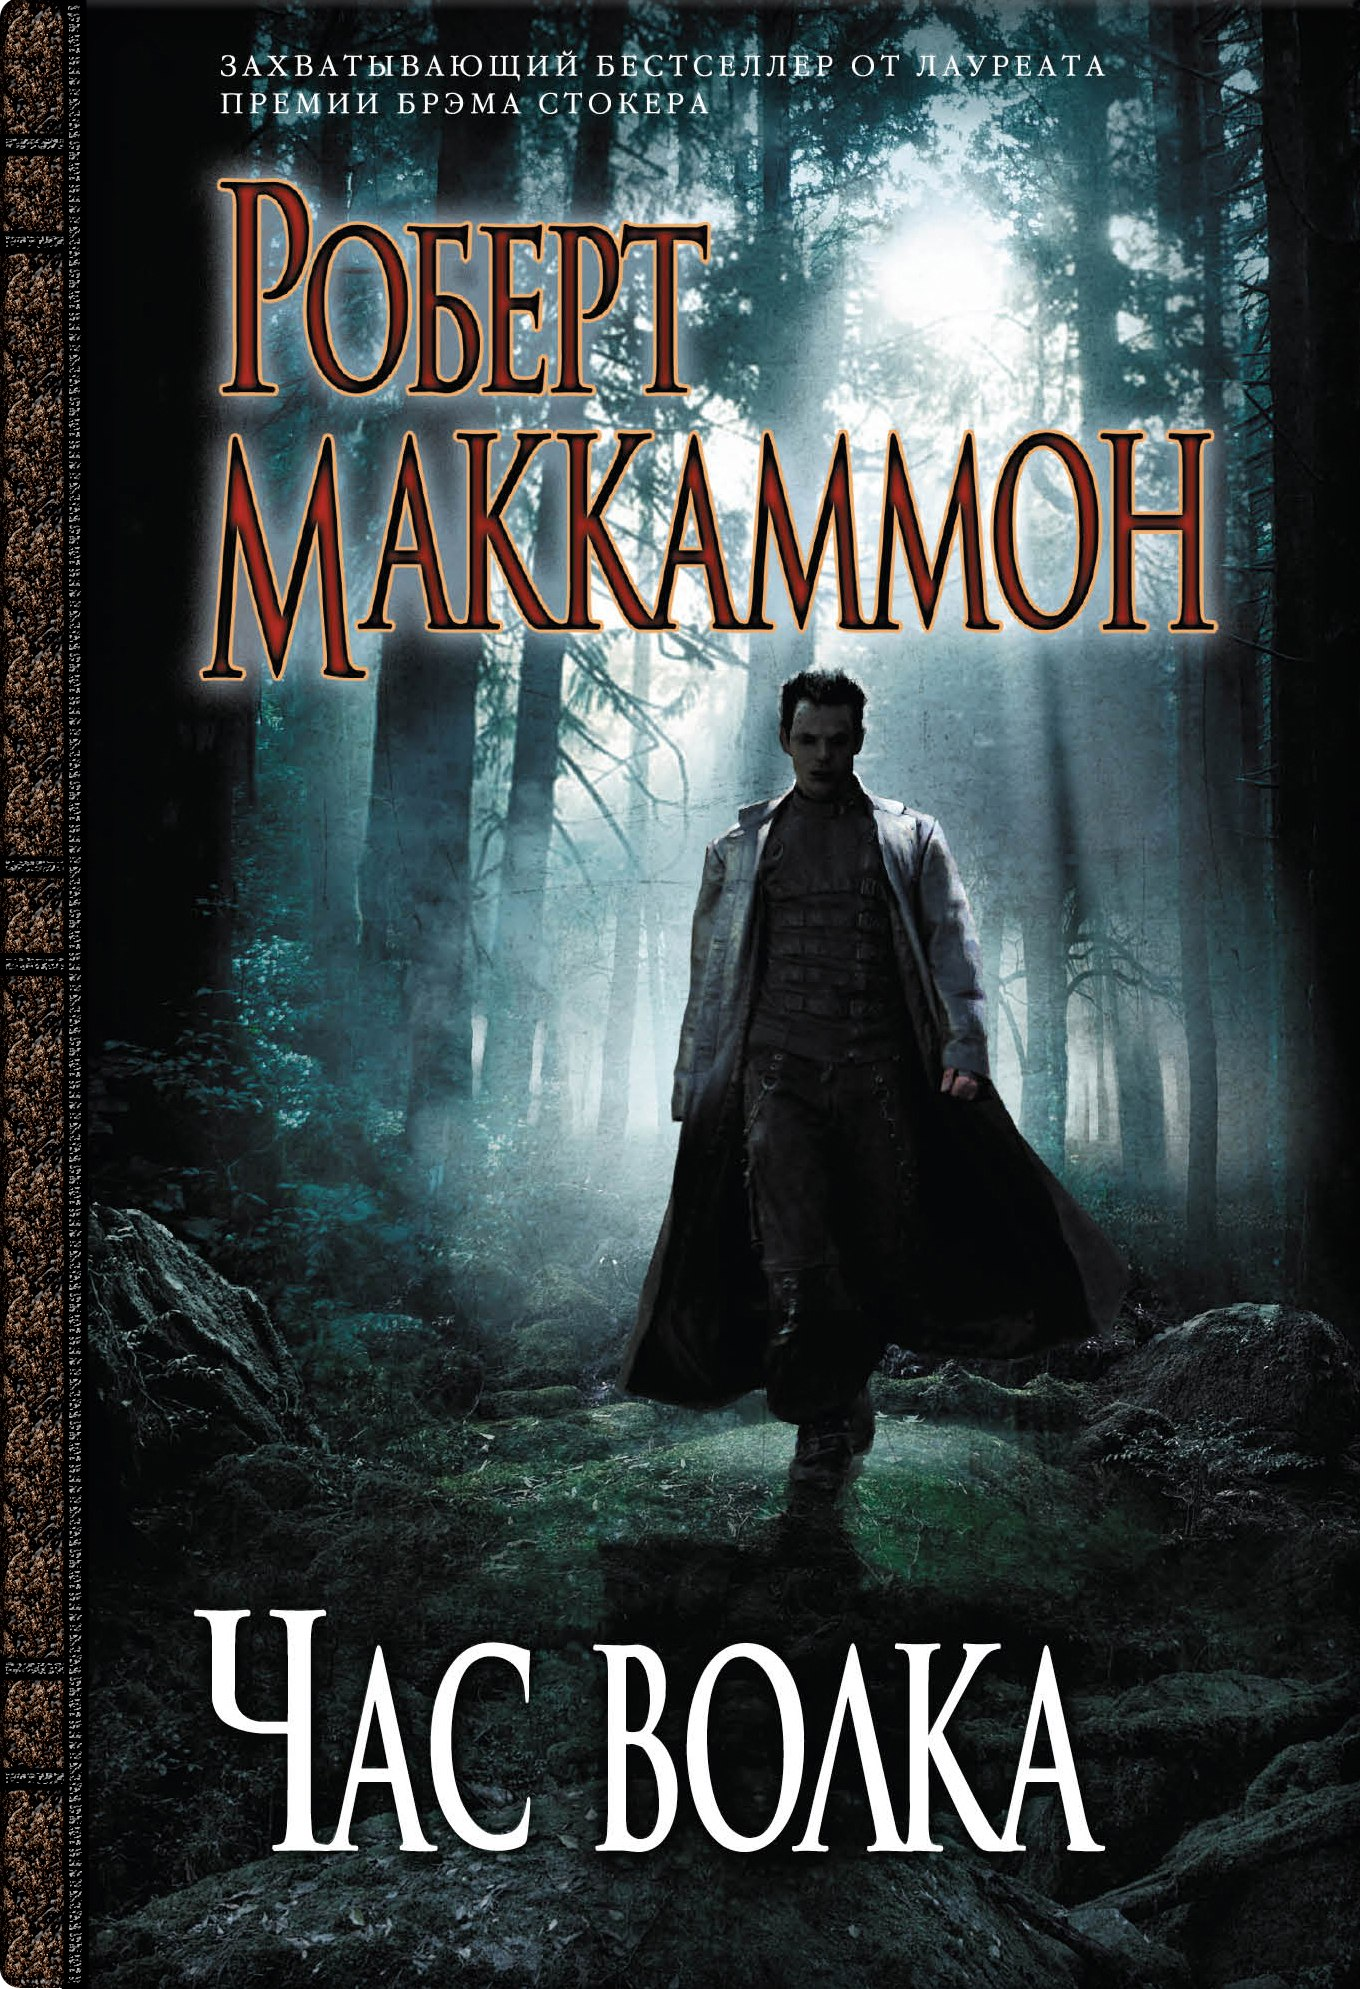 """Роберт Маккаммон - Час волка"" (1989) - отзыв о книге"